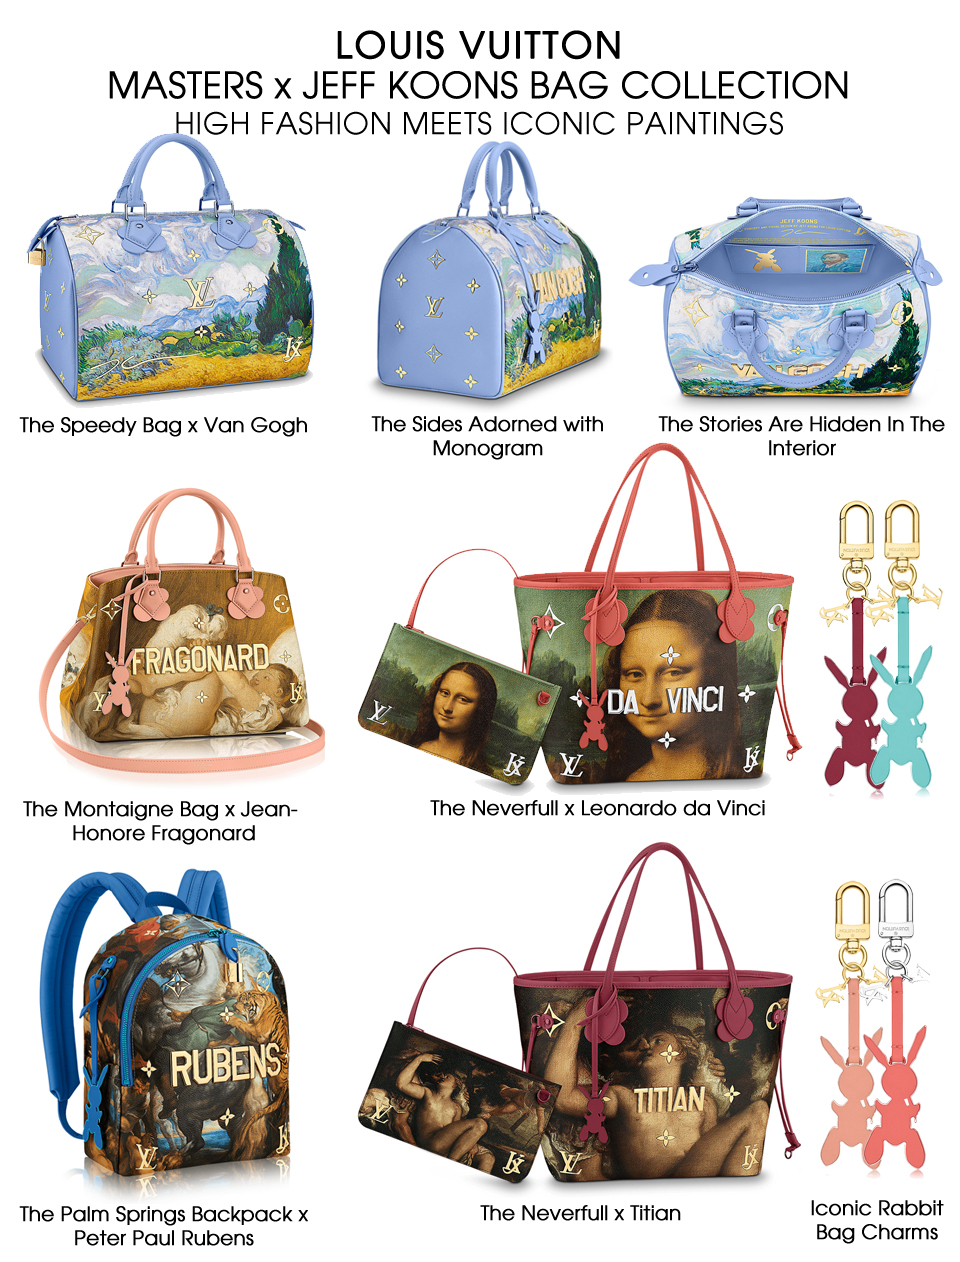 Louis Vuitton clipart designer handbag X Koons Masters Jeff Masters